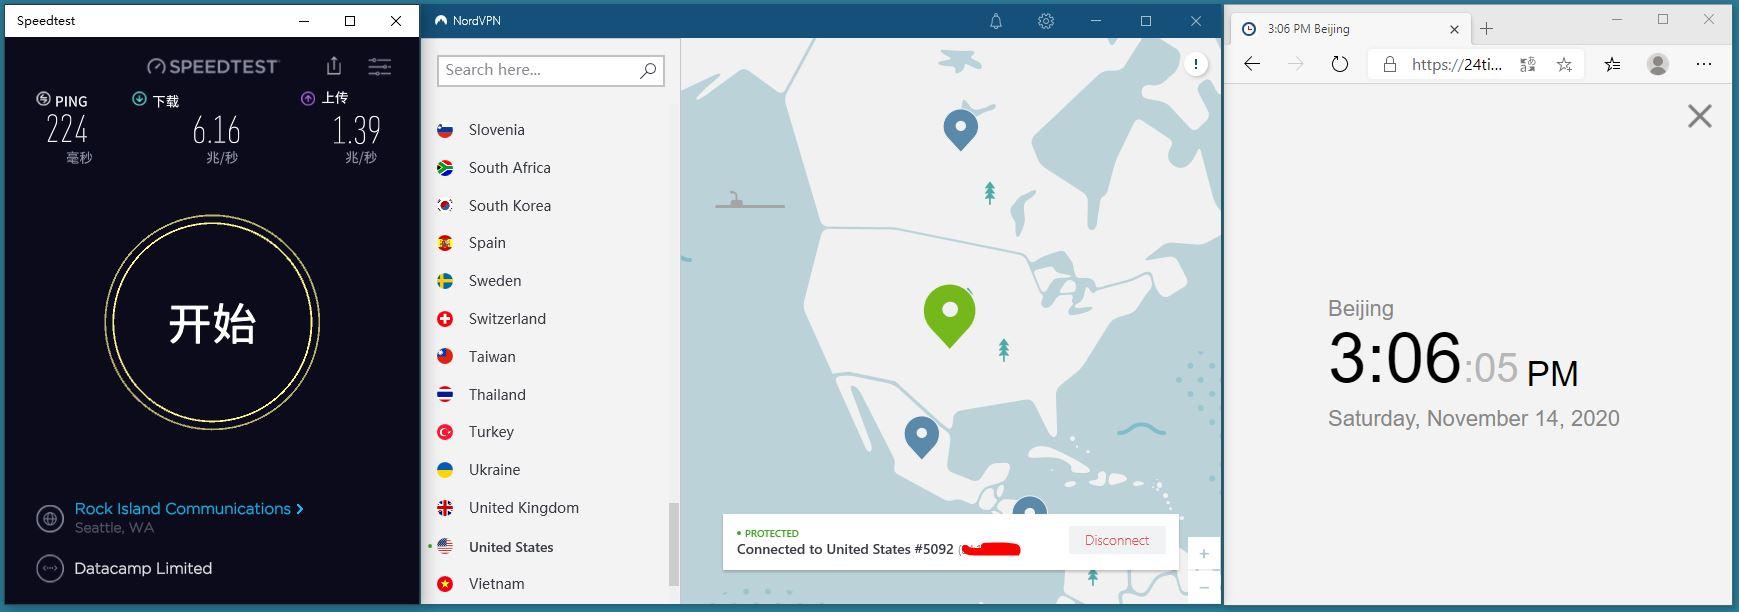 Windows10 NordVPN OpenVPN-UDP USA 5092 服务器 中国VPN 翻墙 科学上网 测试 - 20201114